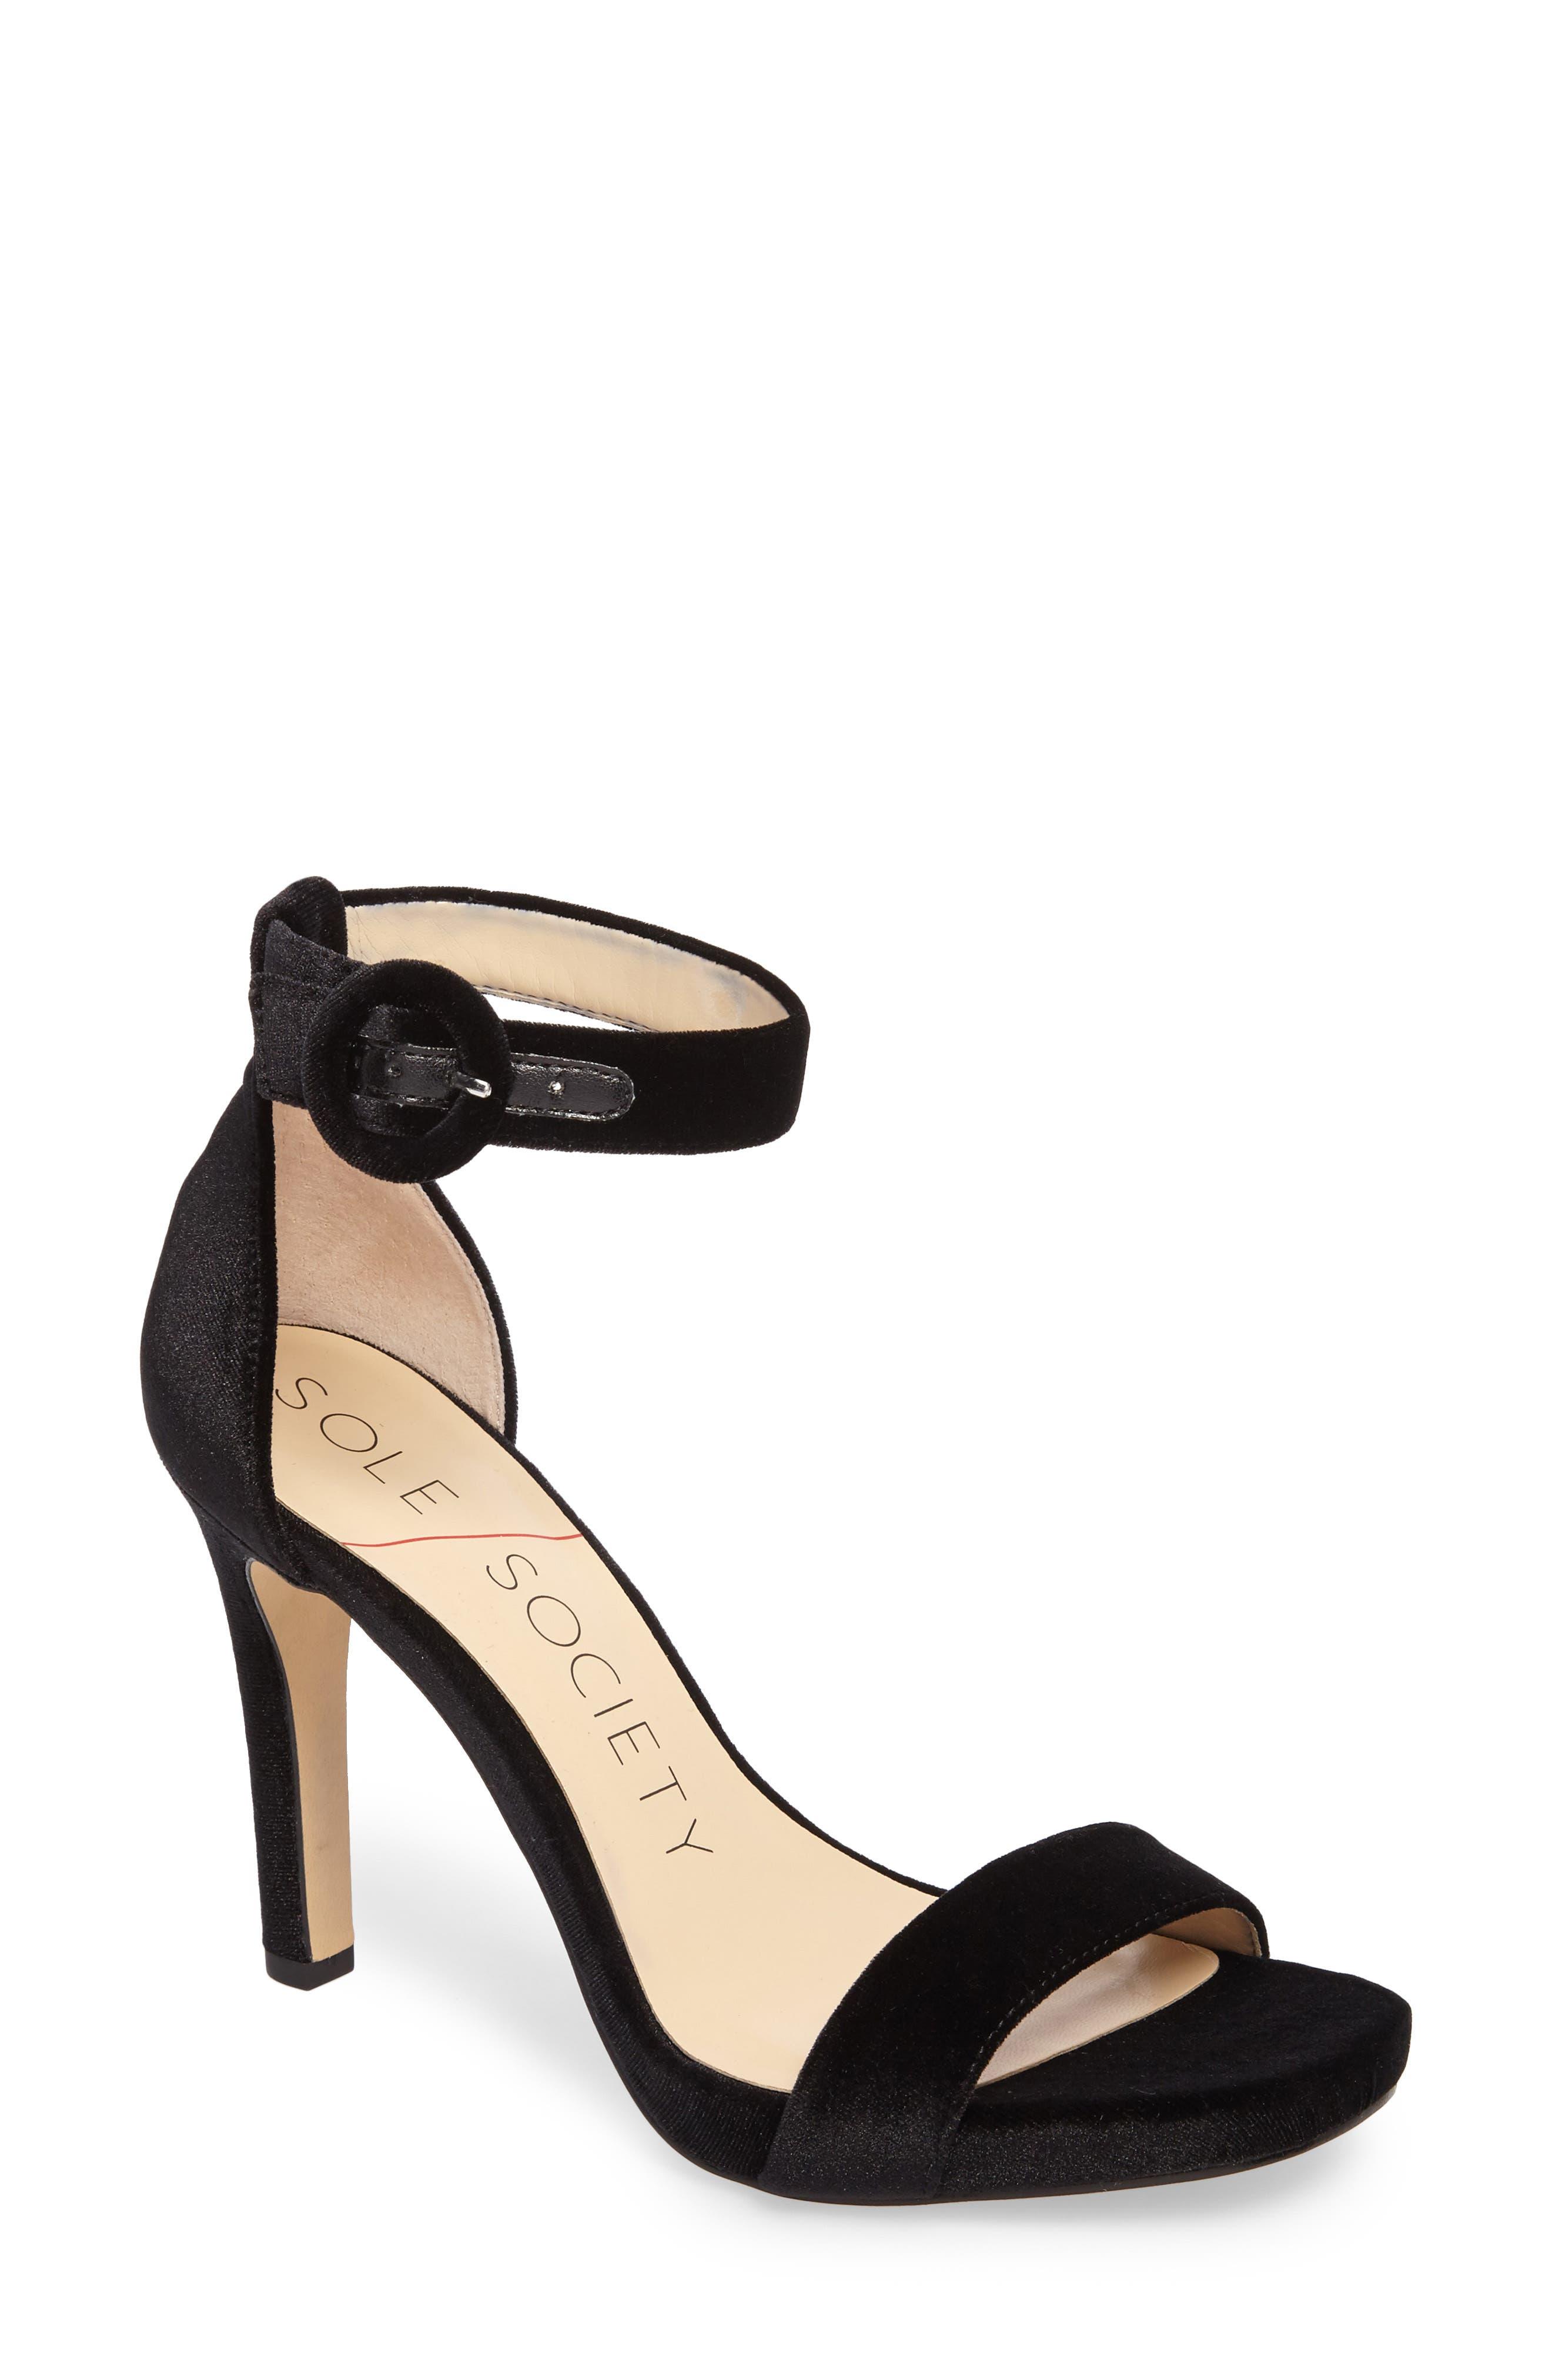 Emelia Ankle Strap Sandal,                         Main,                         color, 001